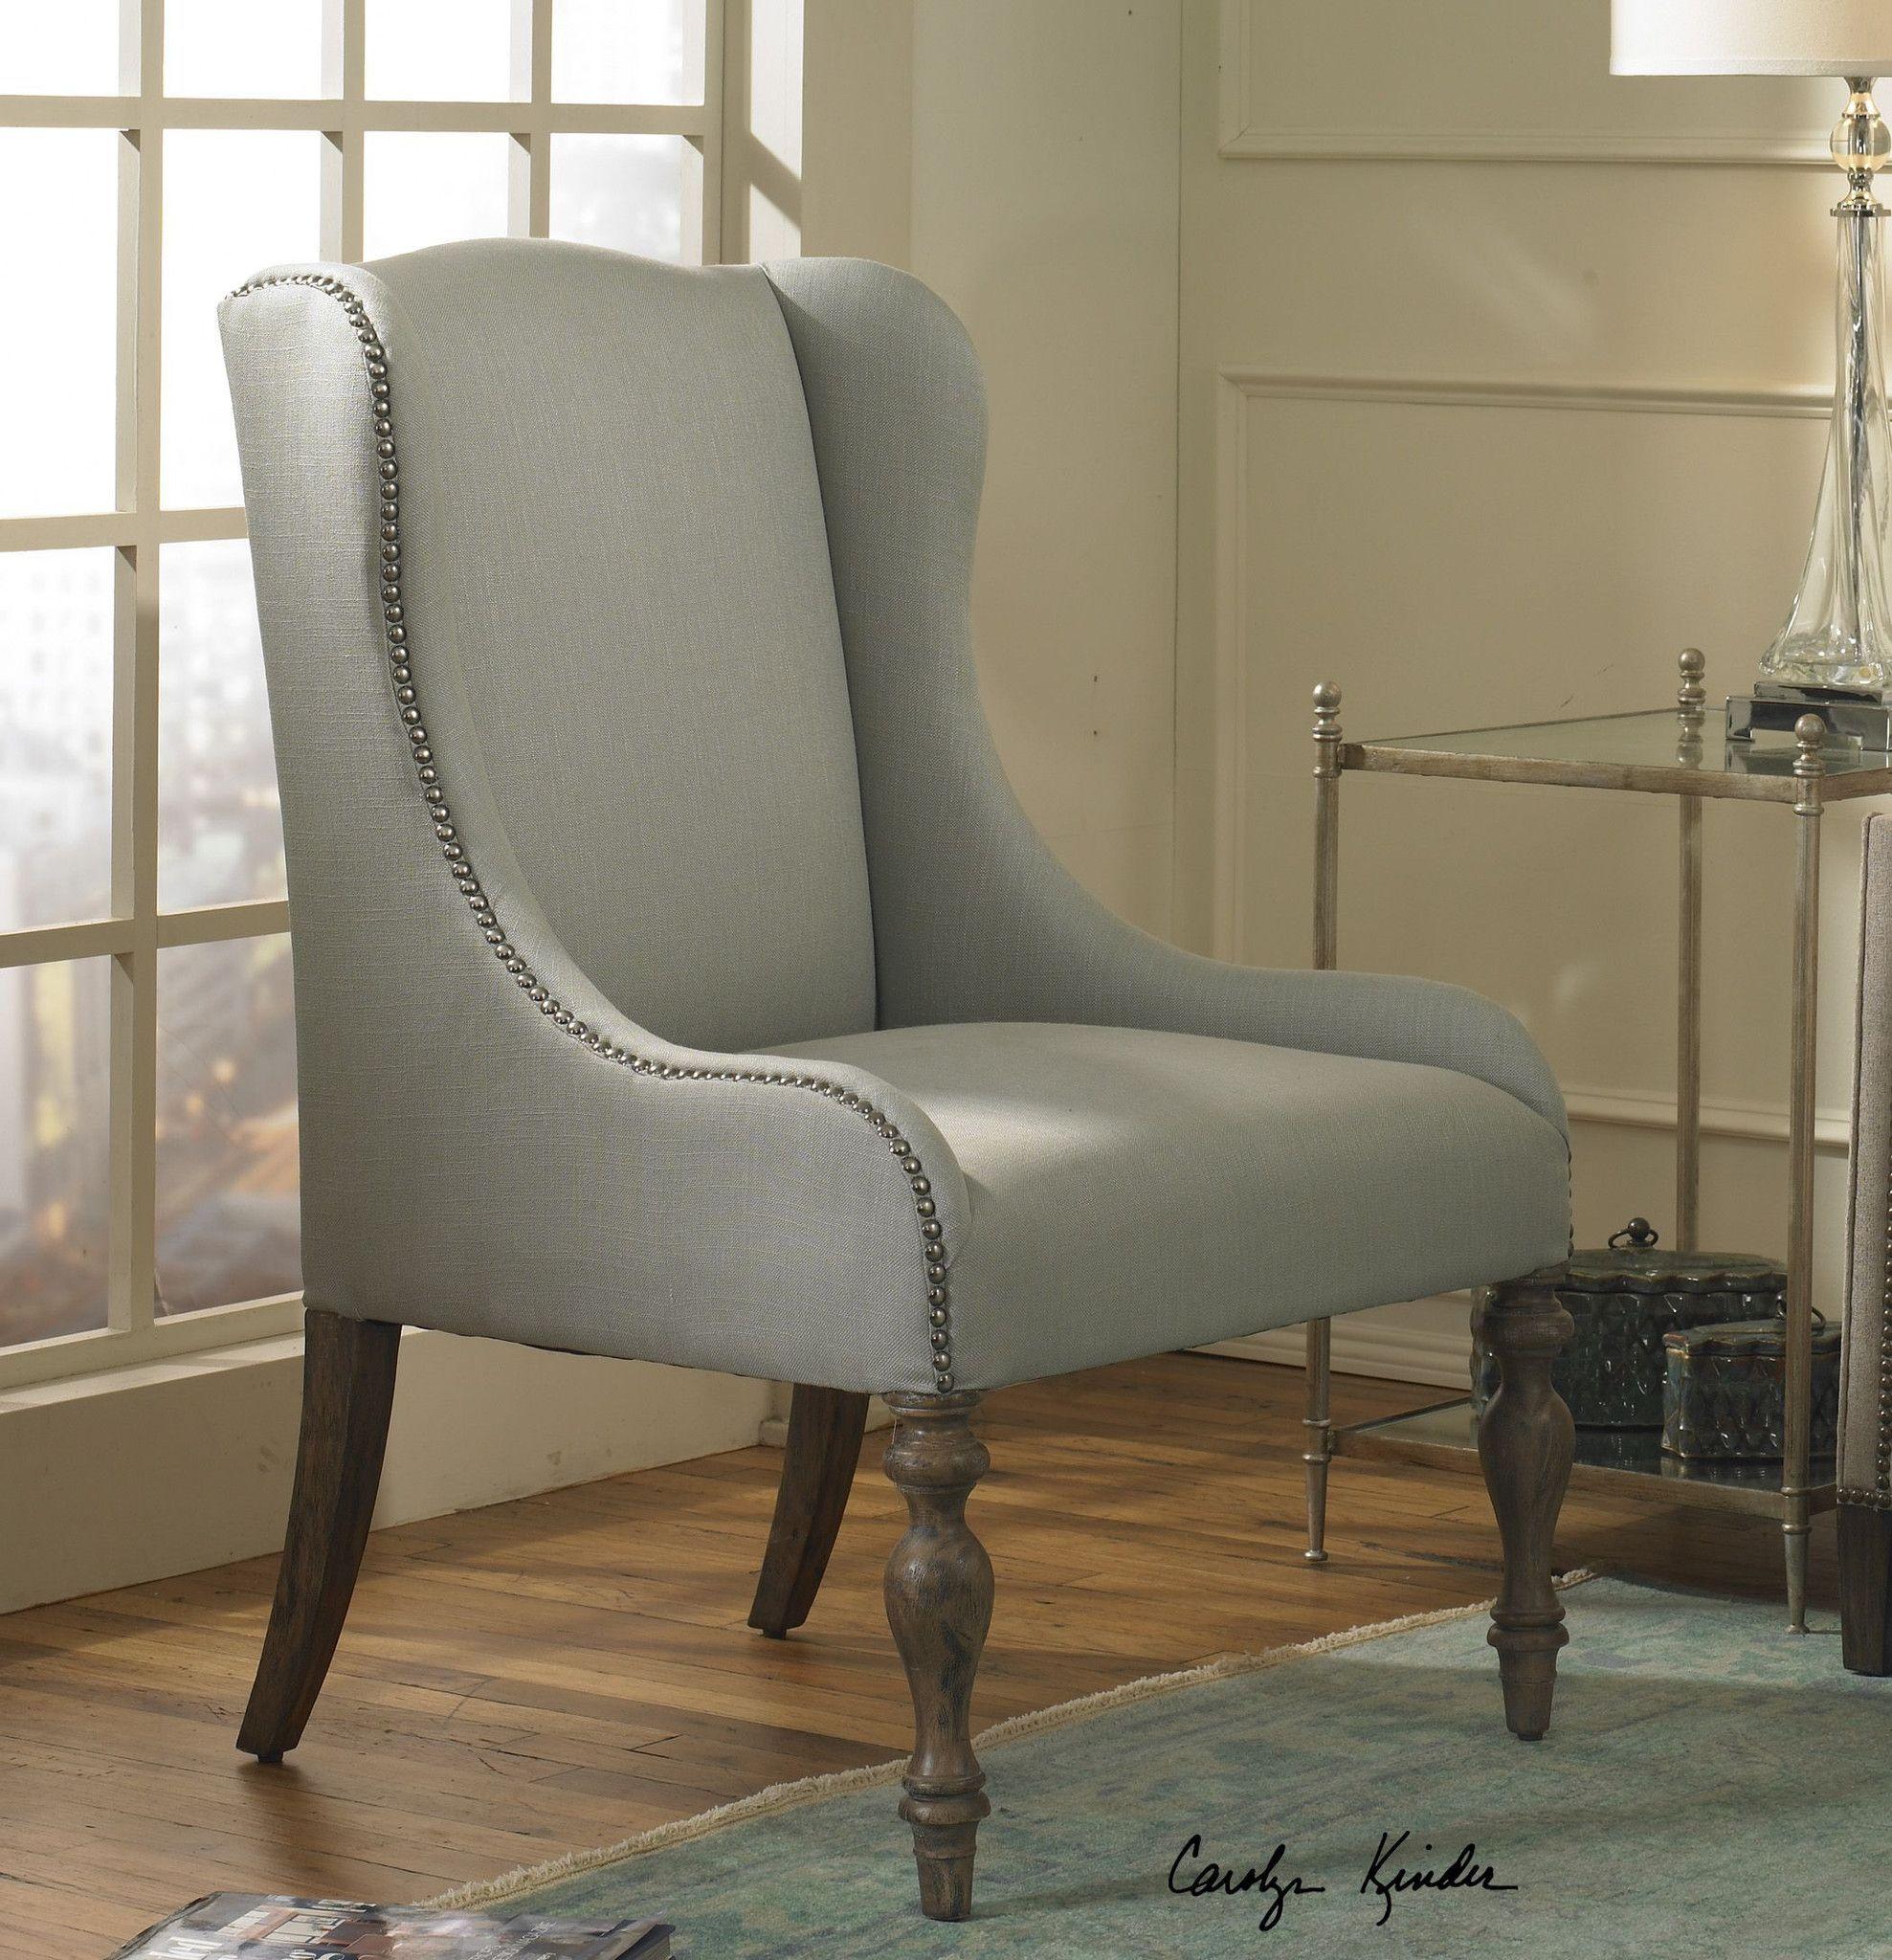 Uttermost Filon Wing Chair: Buy Uttermost UTT-23120 Filon Wing Chair